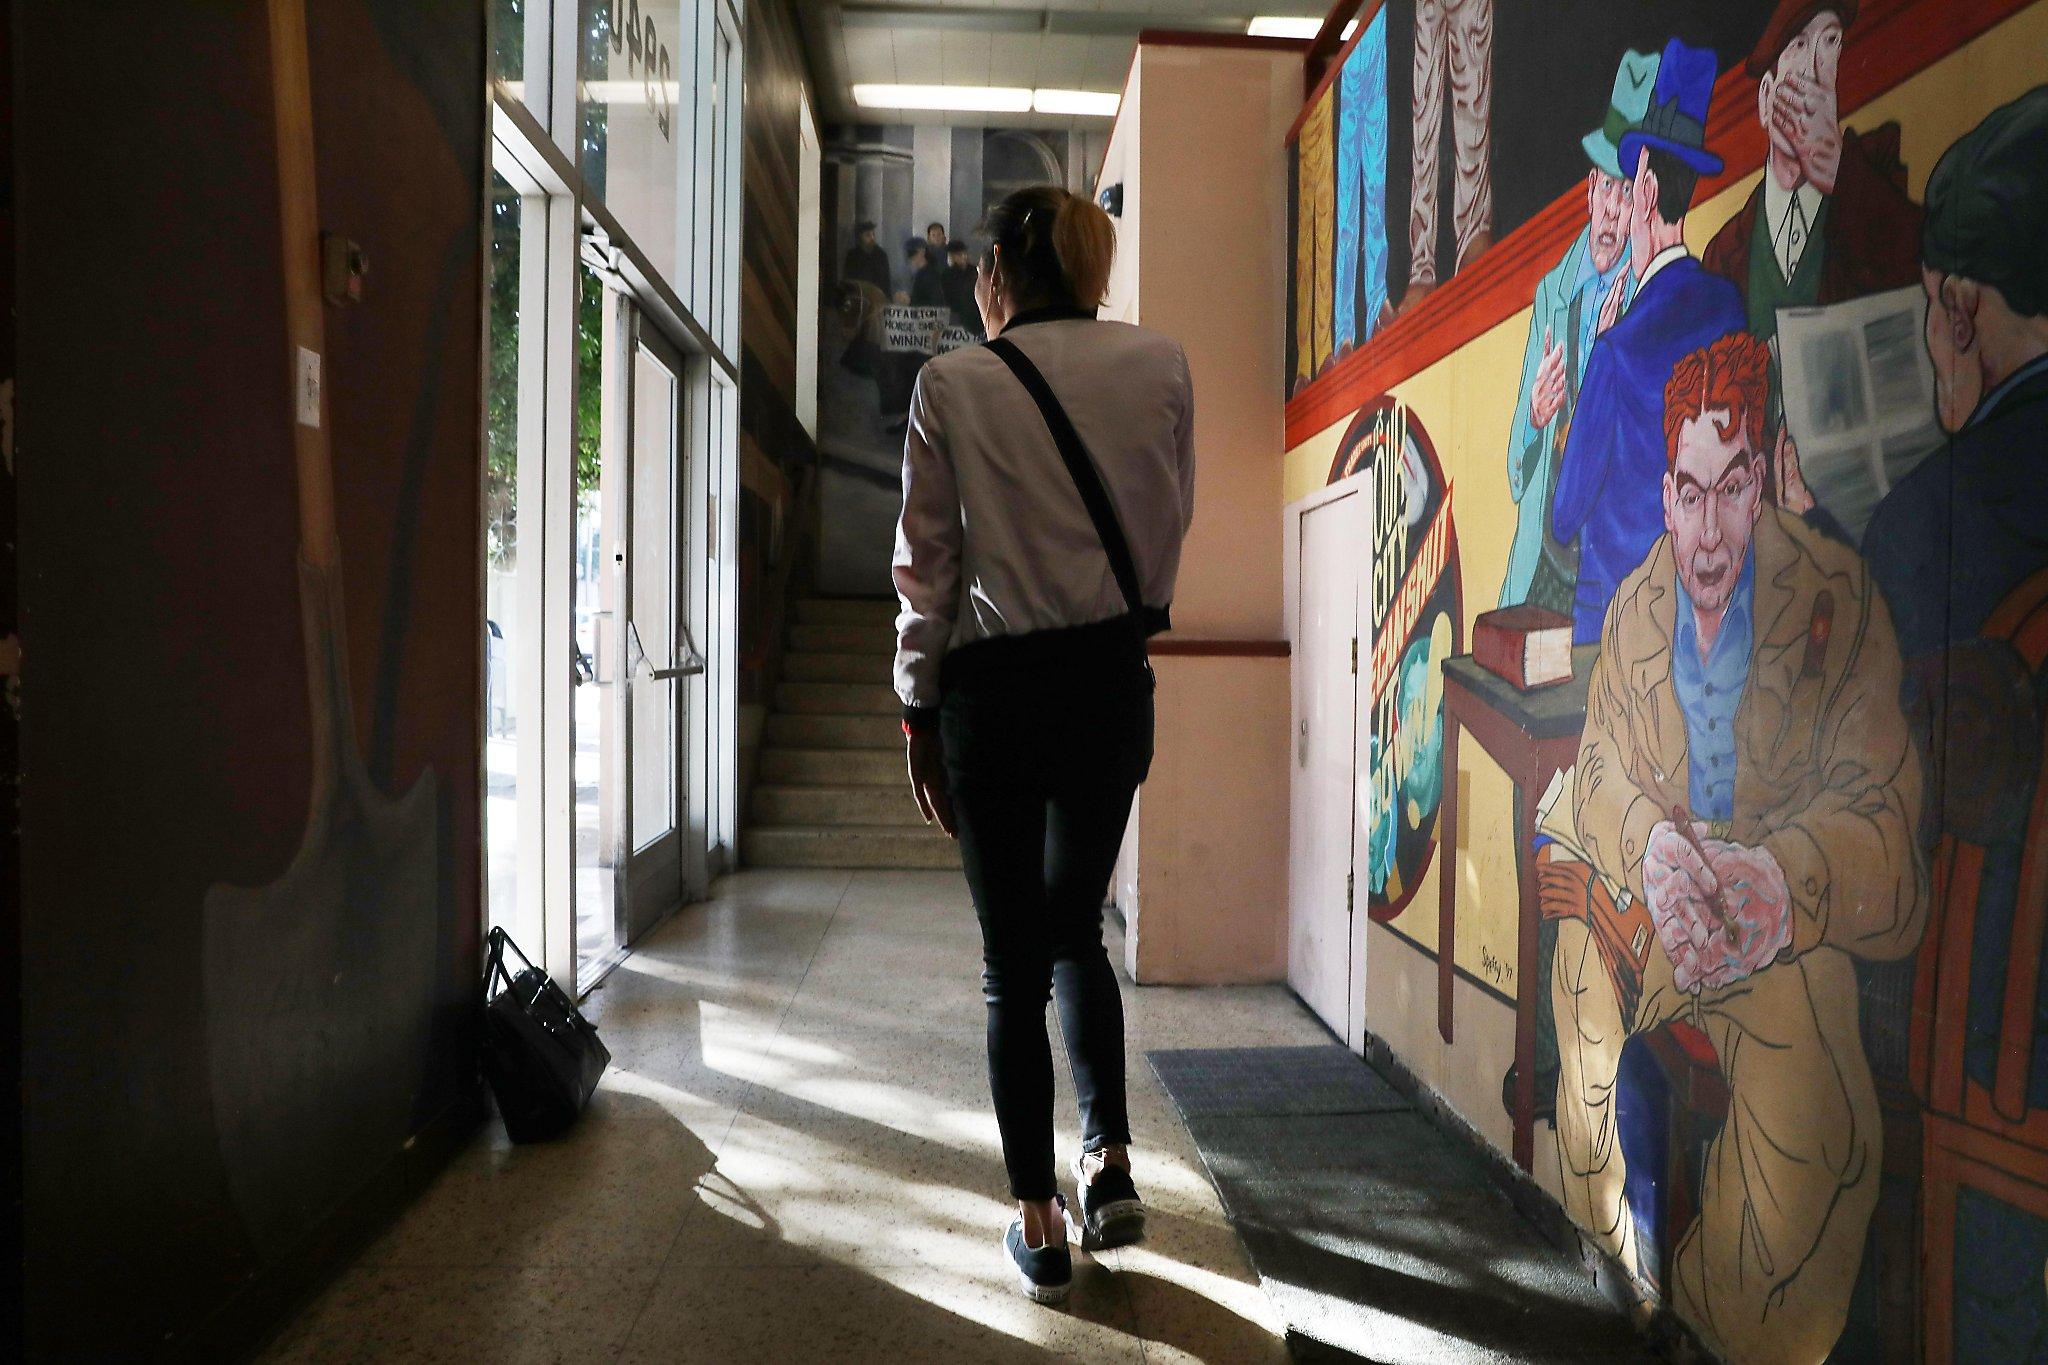 Two transgender women joined migrant caravan  Only one